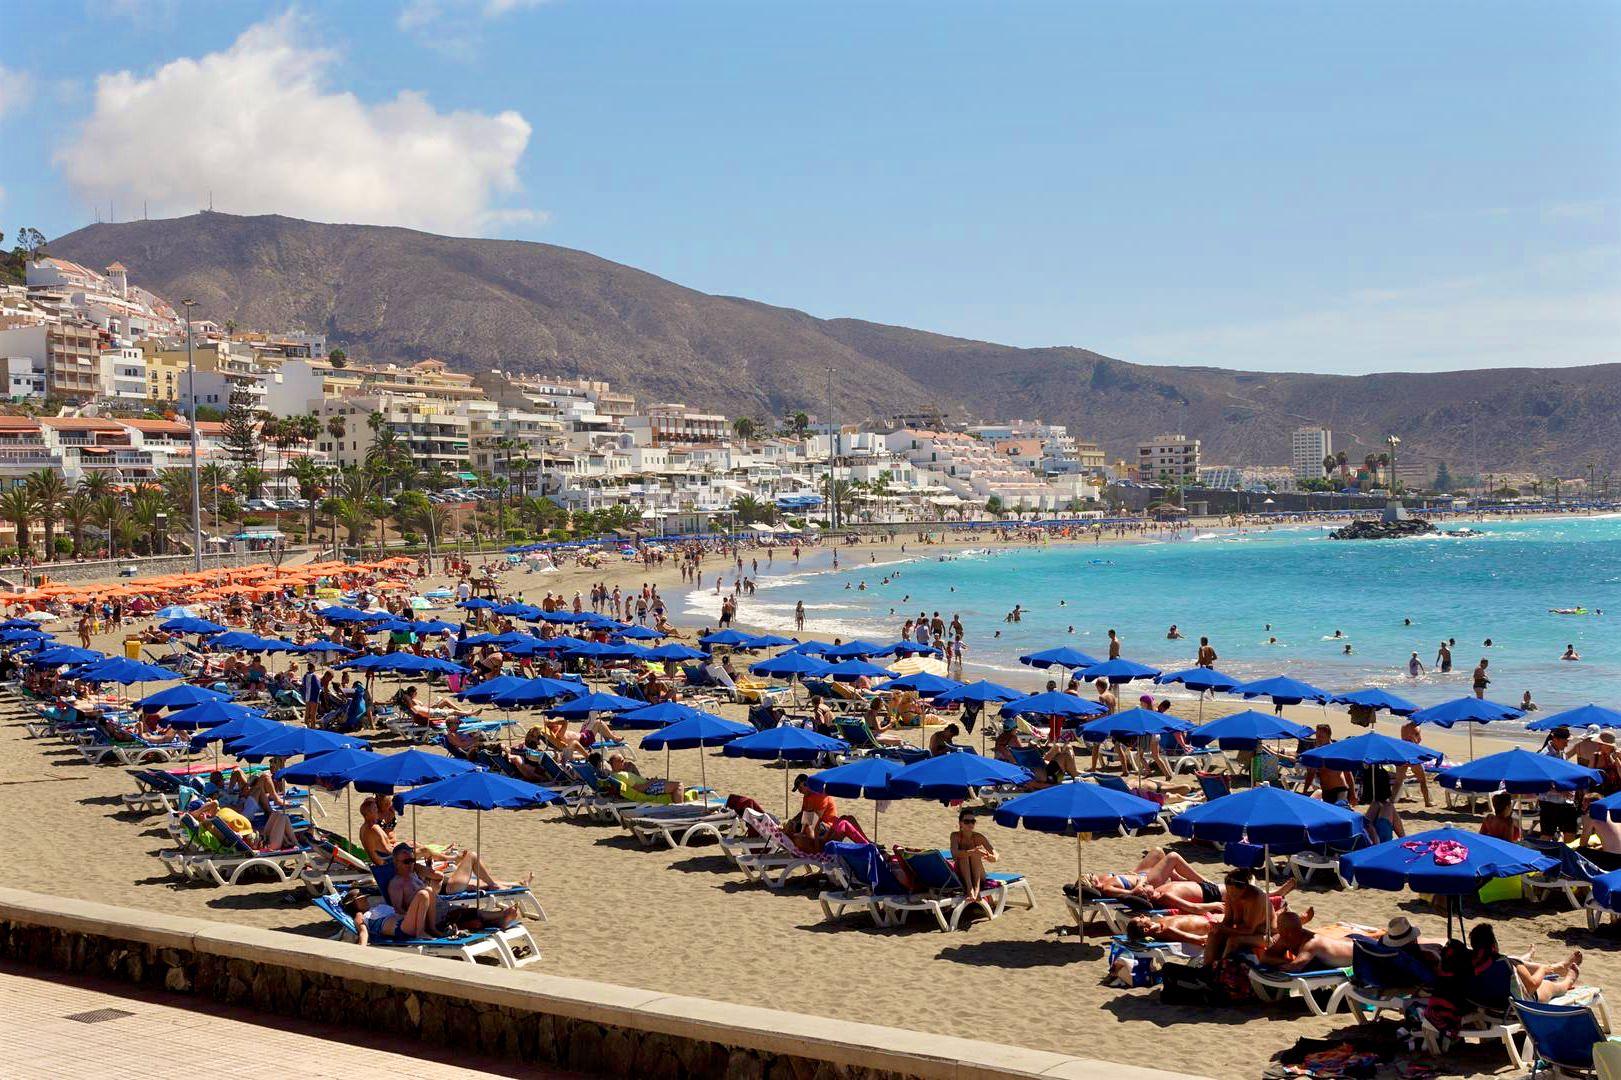 пляж лас америкас тенерифе фото передаются через пищу